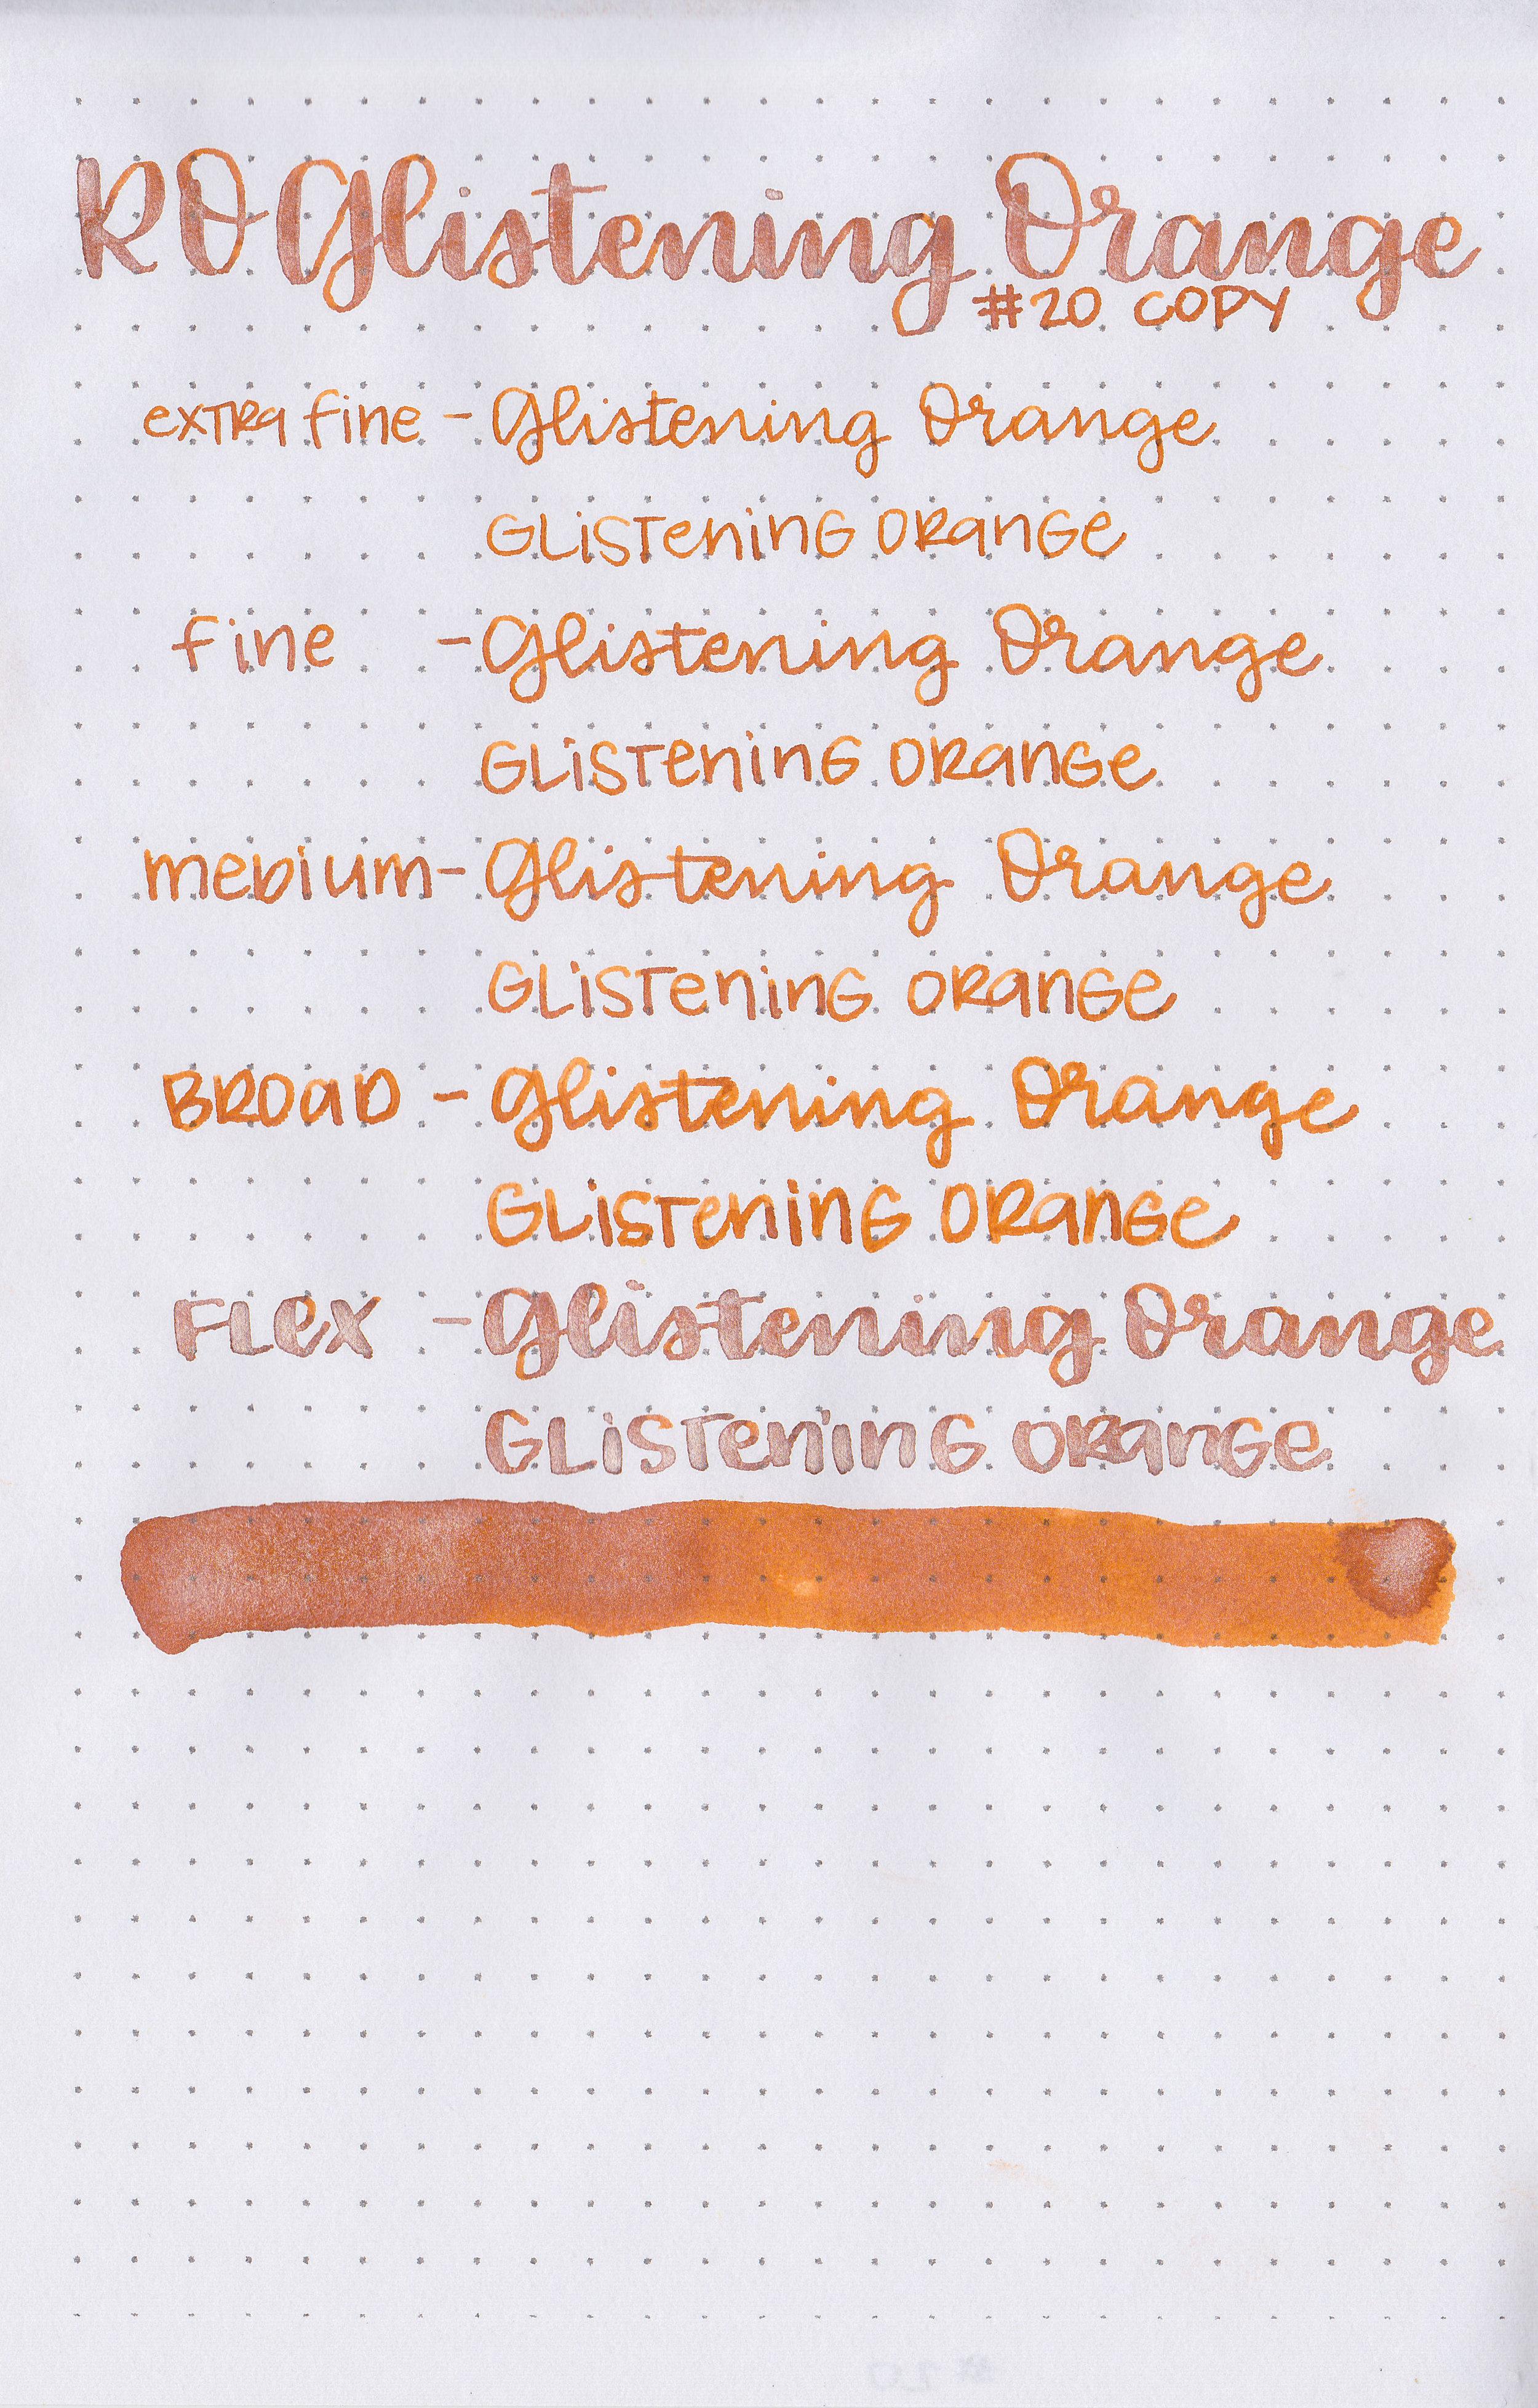 ro-glistening-orange-rumble-6.jpg